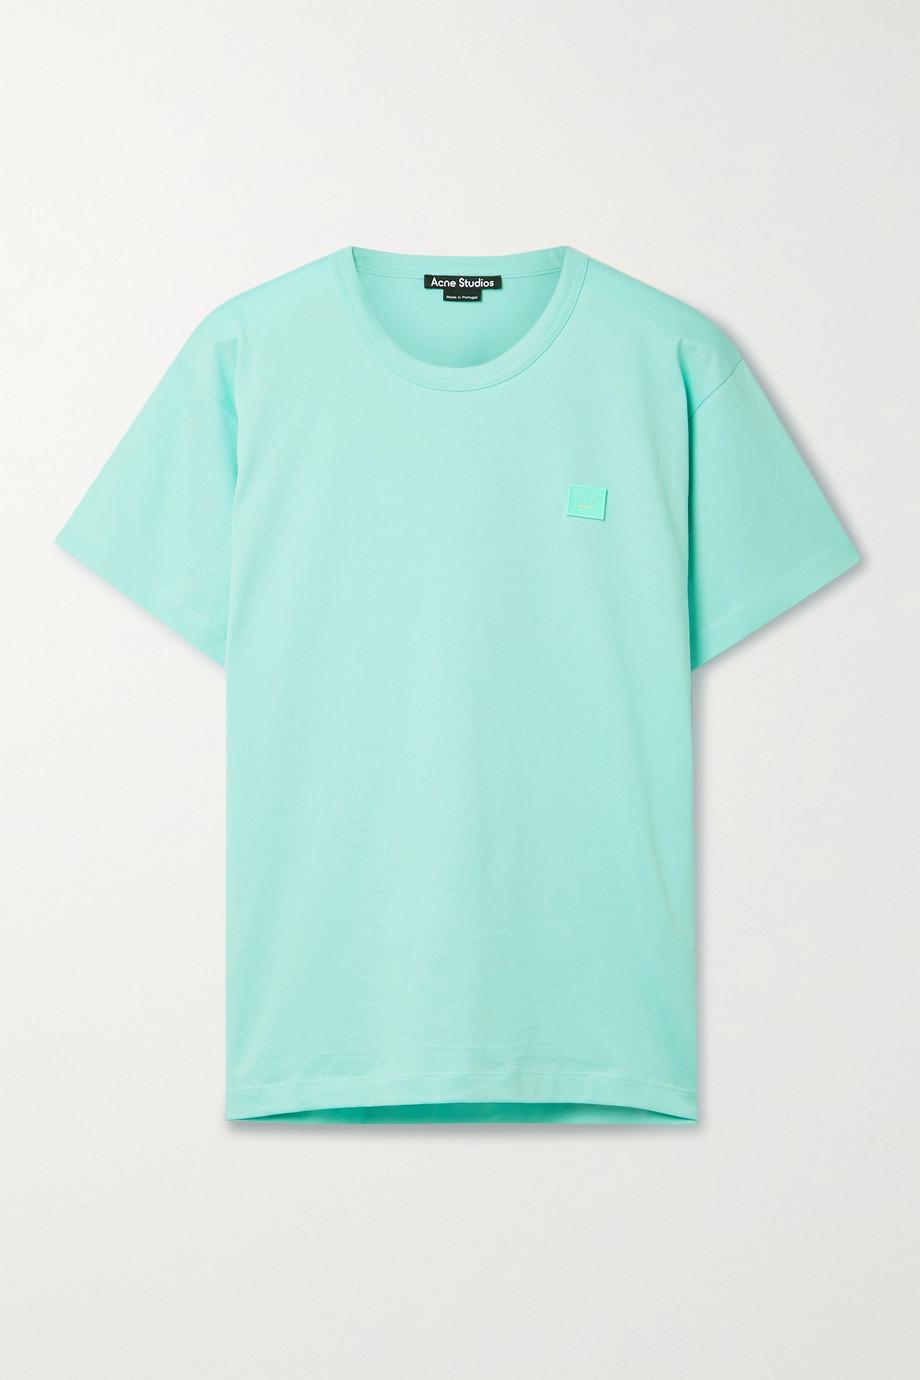 Acne Studios + NET SUSTAIN appliquéd organic cotton-jersey T-shirt